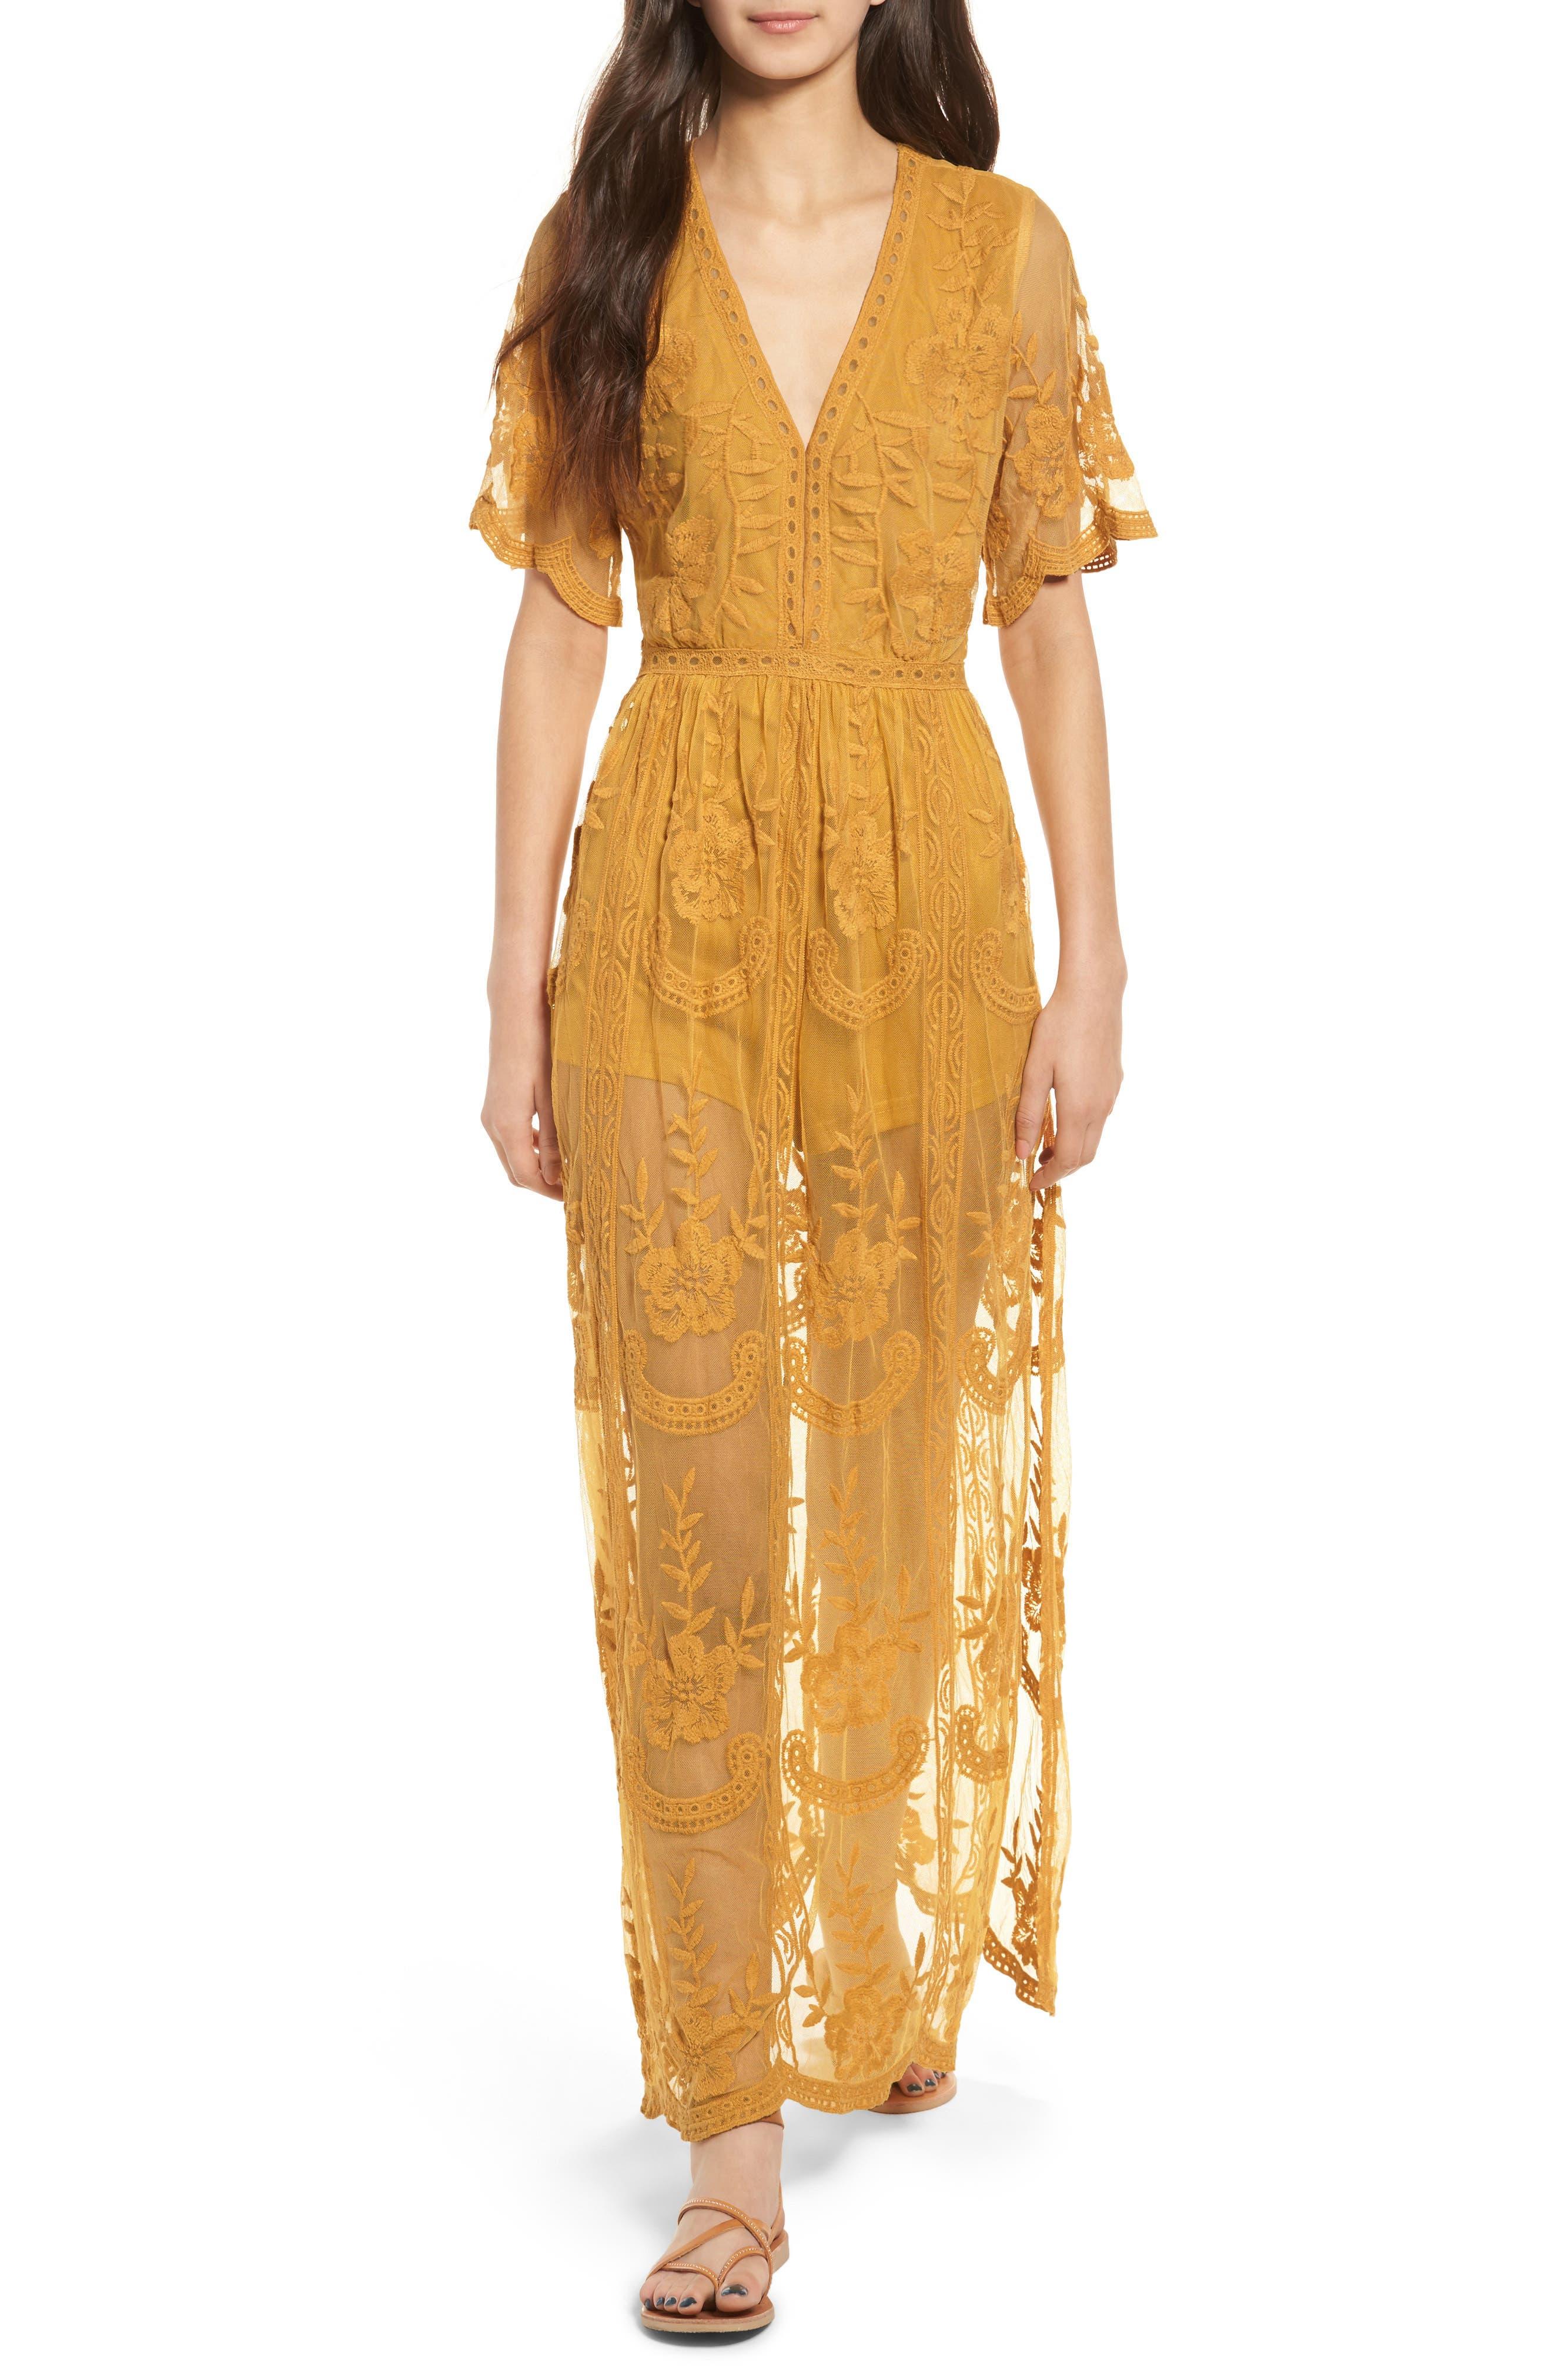 Black an yellow dresses